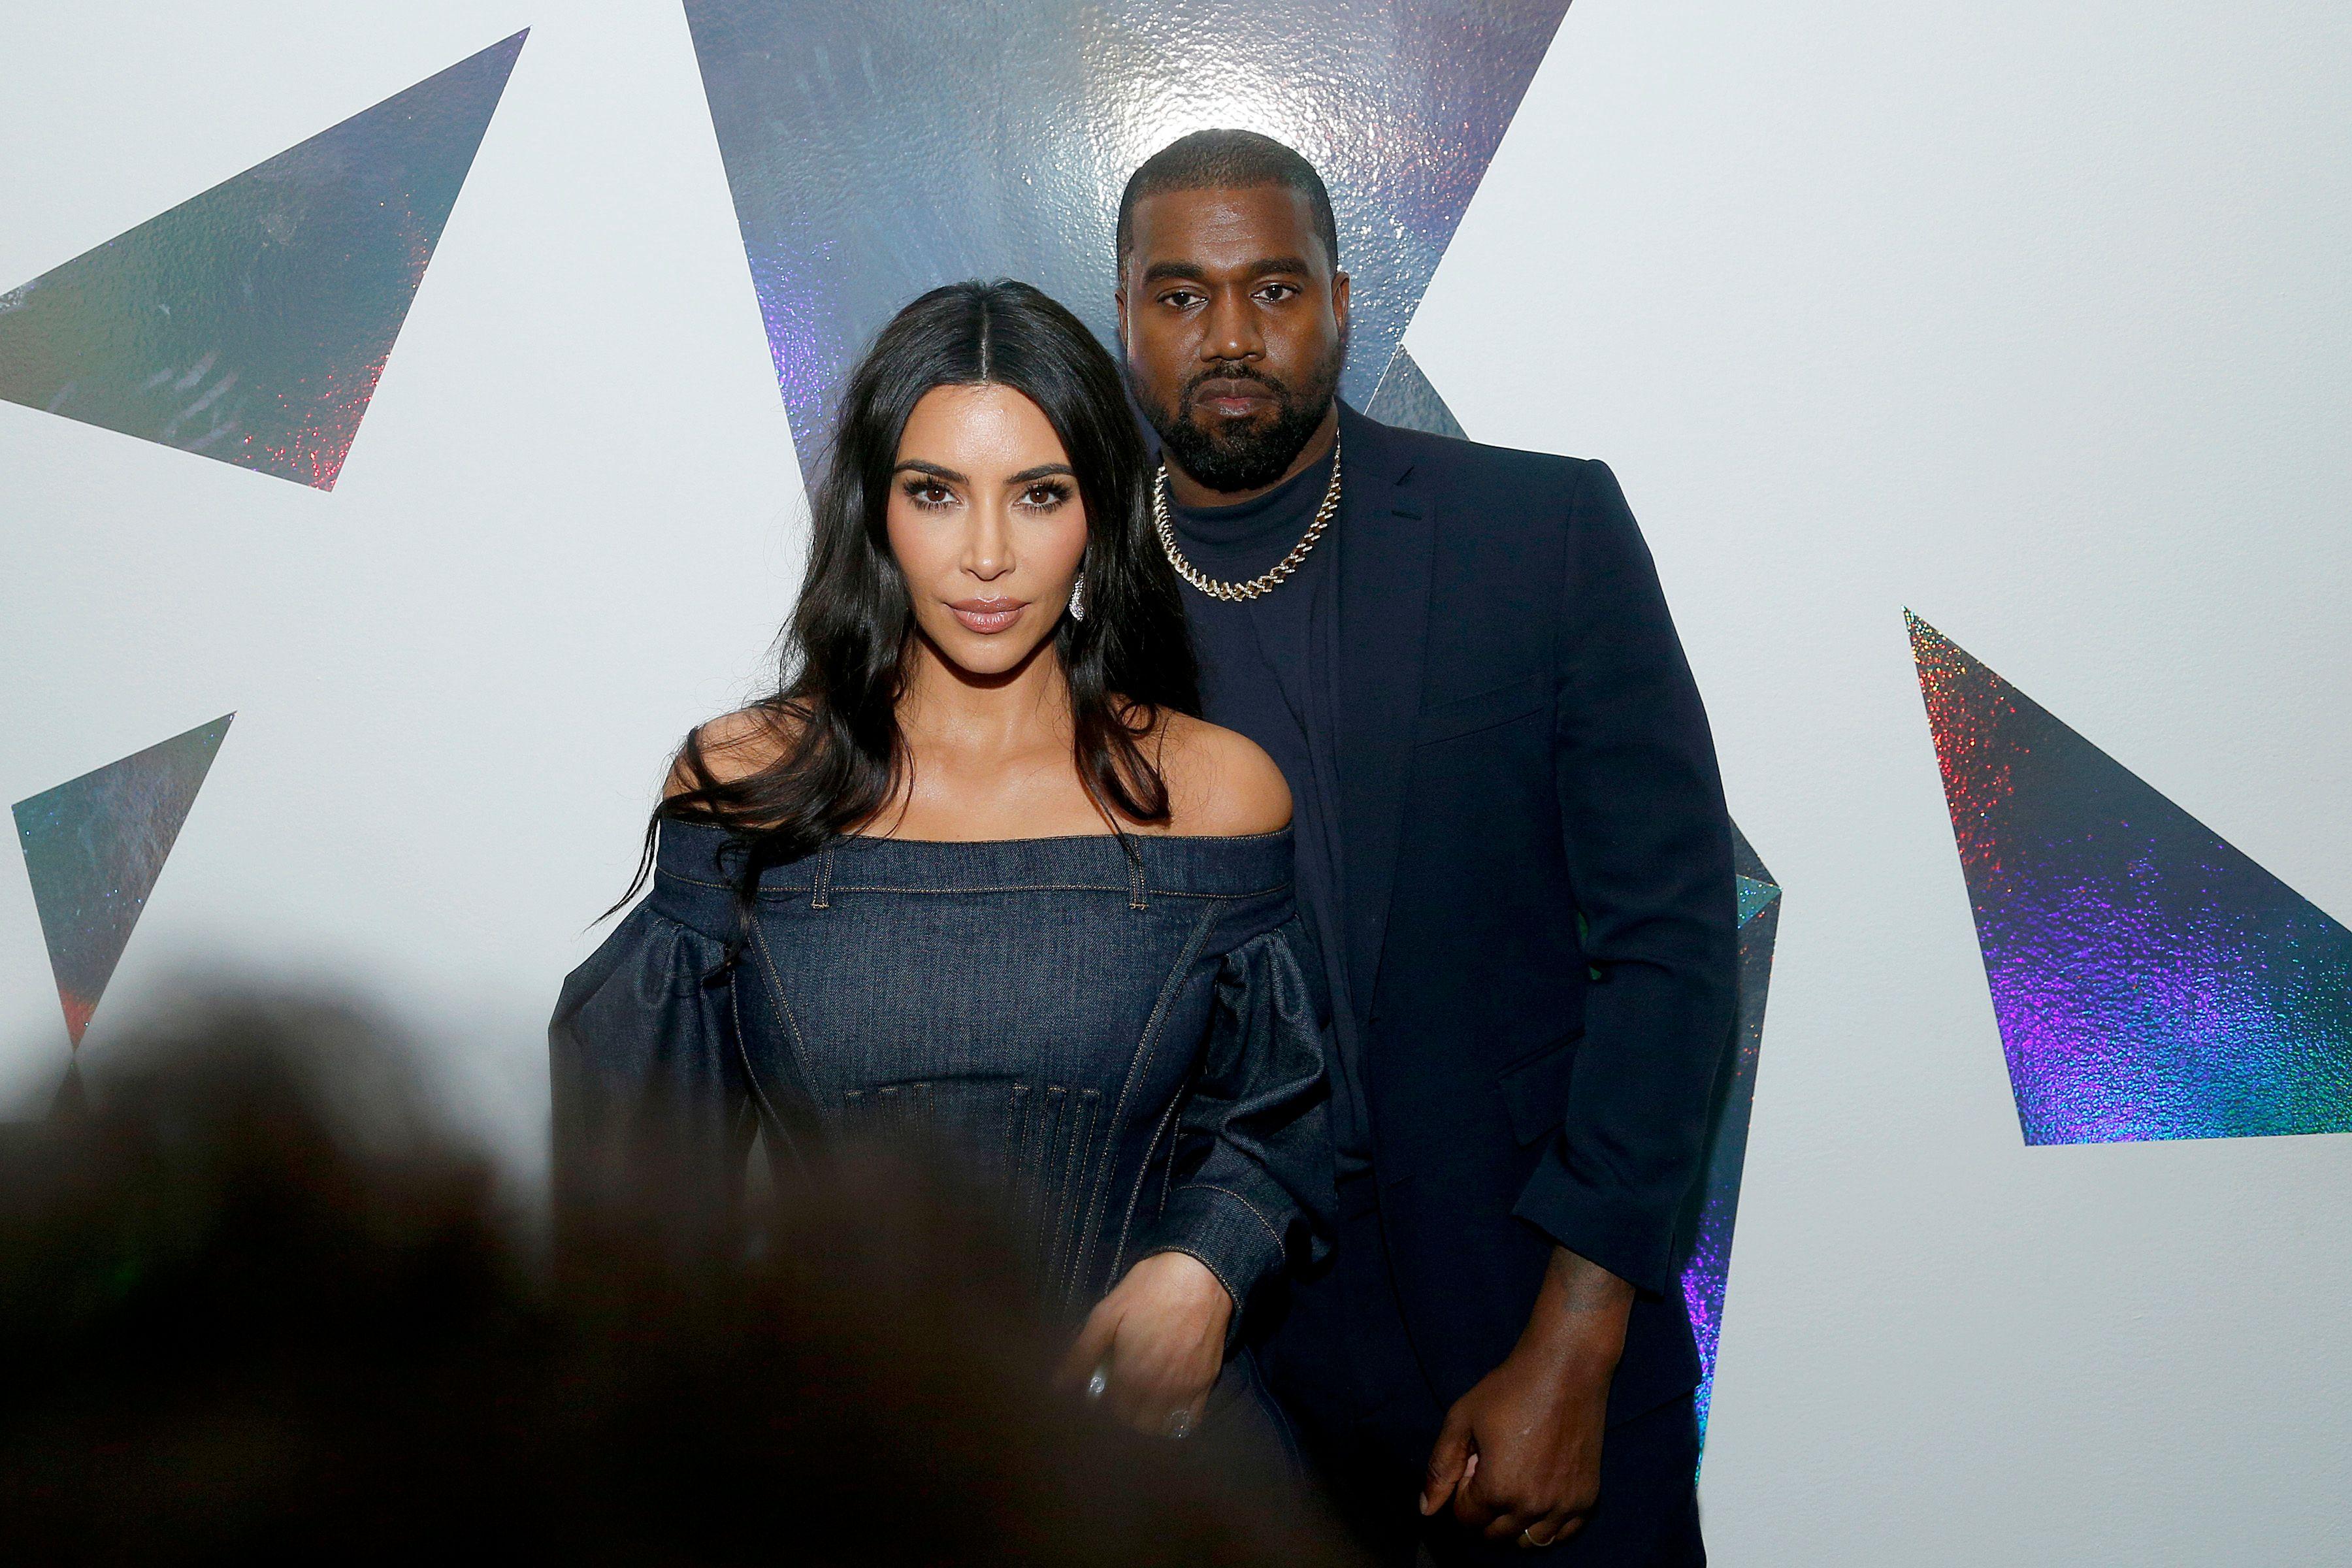 Kim Kardashian and her rapper husband, Kanye West